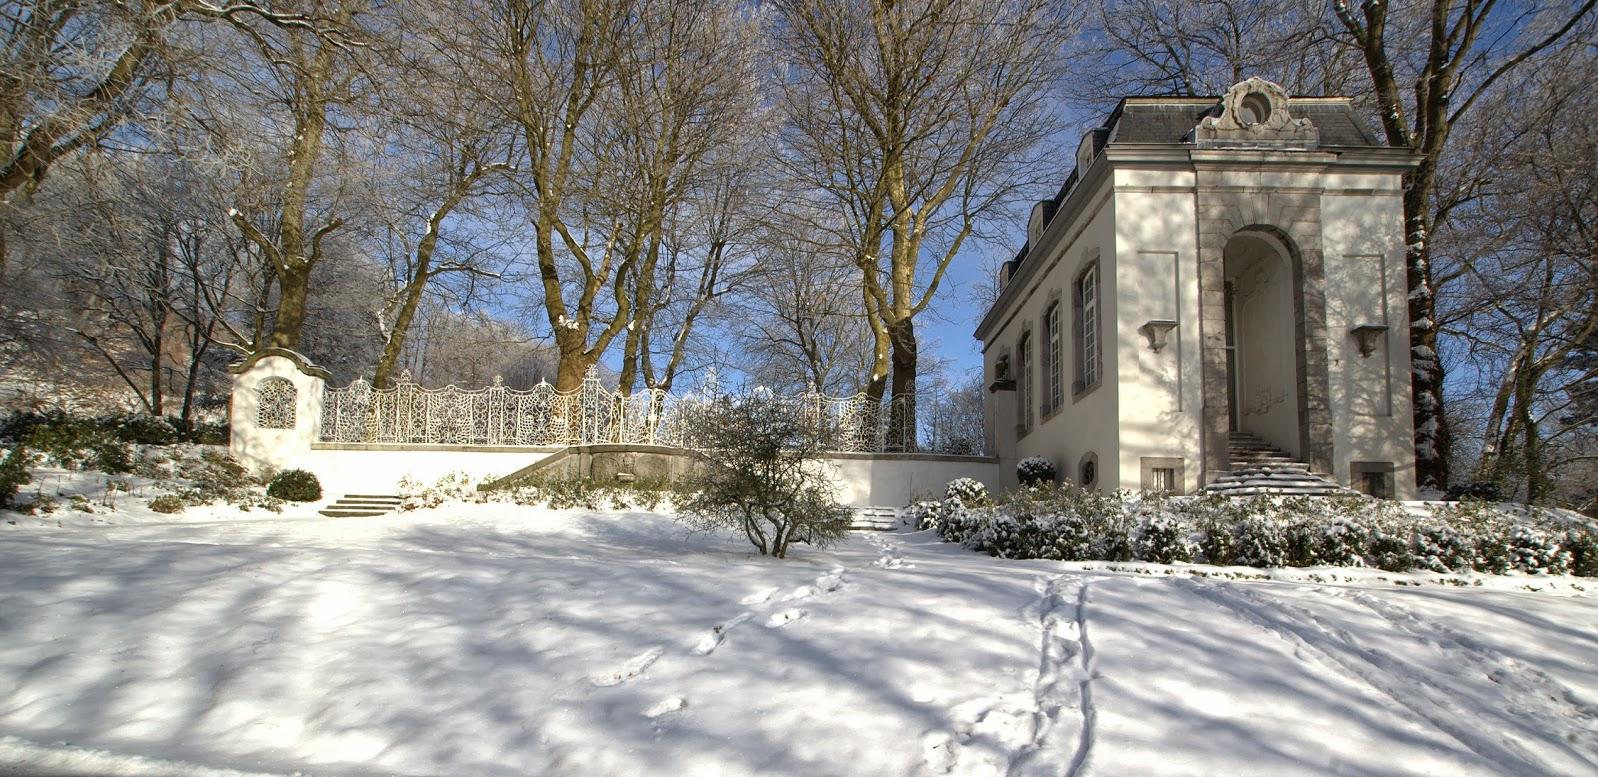 Der Lousberg / Aachen - Germany ... im Winter ... Kerstenscher Pavillon !